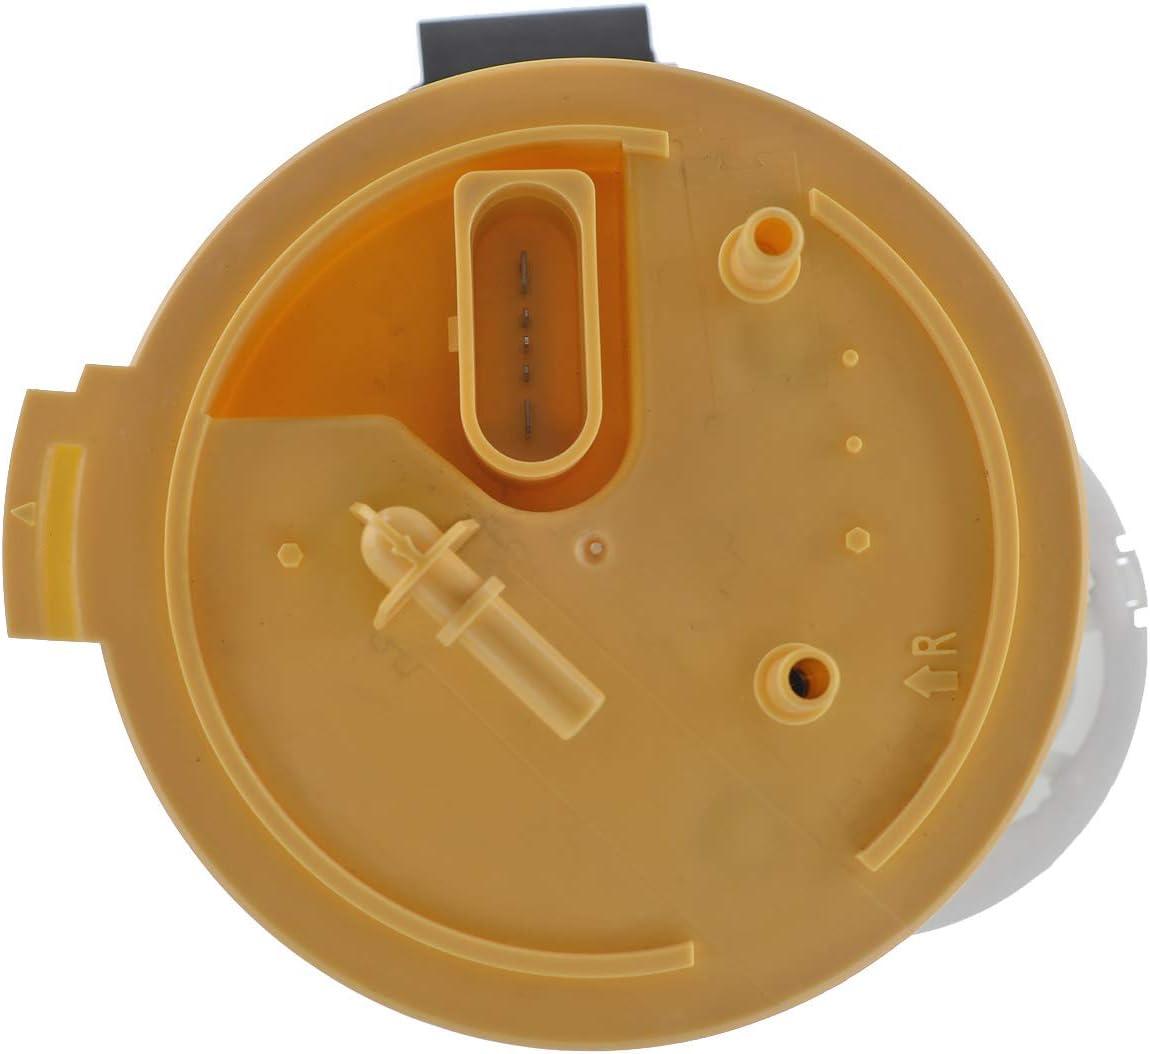 Kraftstoffpumpe F/ördereinheit Tankgeber f/ür Passat 3C2 3C5 1.9L 2.0L Diesel Bj.2005//10-2009//09 TDI